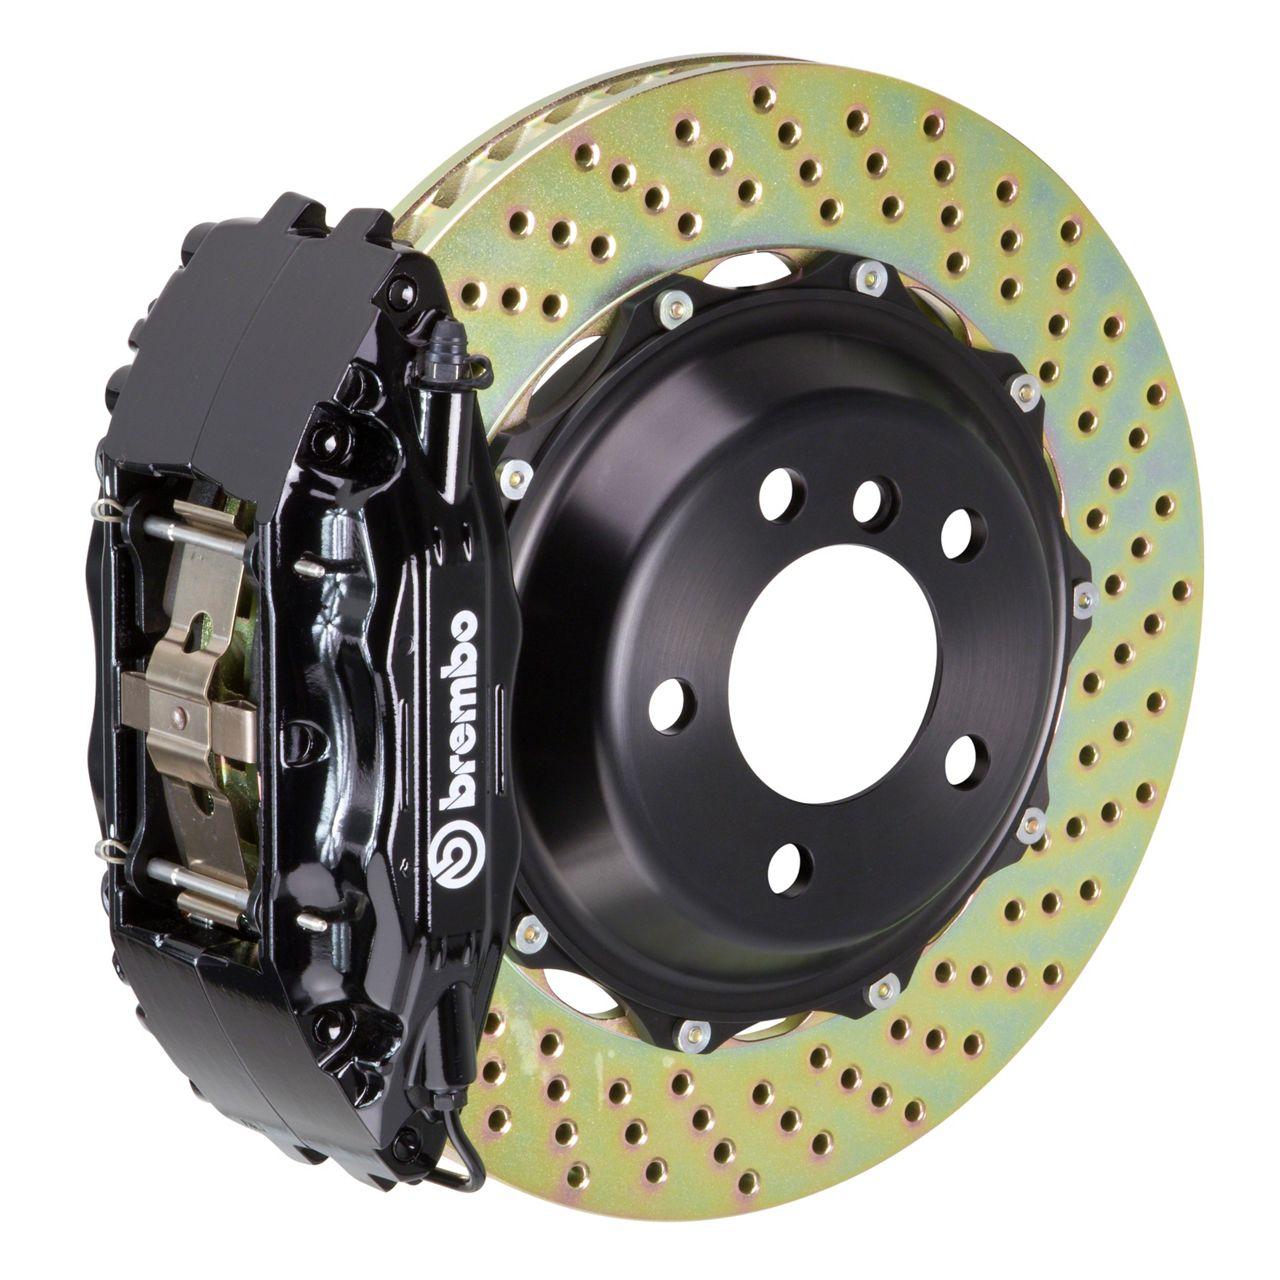 Brembo GT Series 4-Piston Front Big Brake Kit - 14 in. 2-Piece Cross-Drilled Rotors - Black (09-10 R/T, SE)